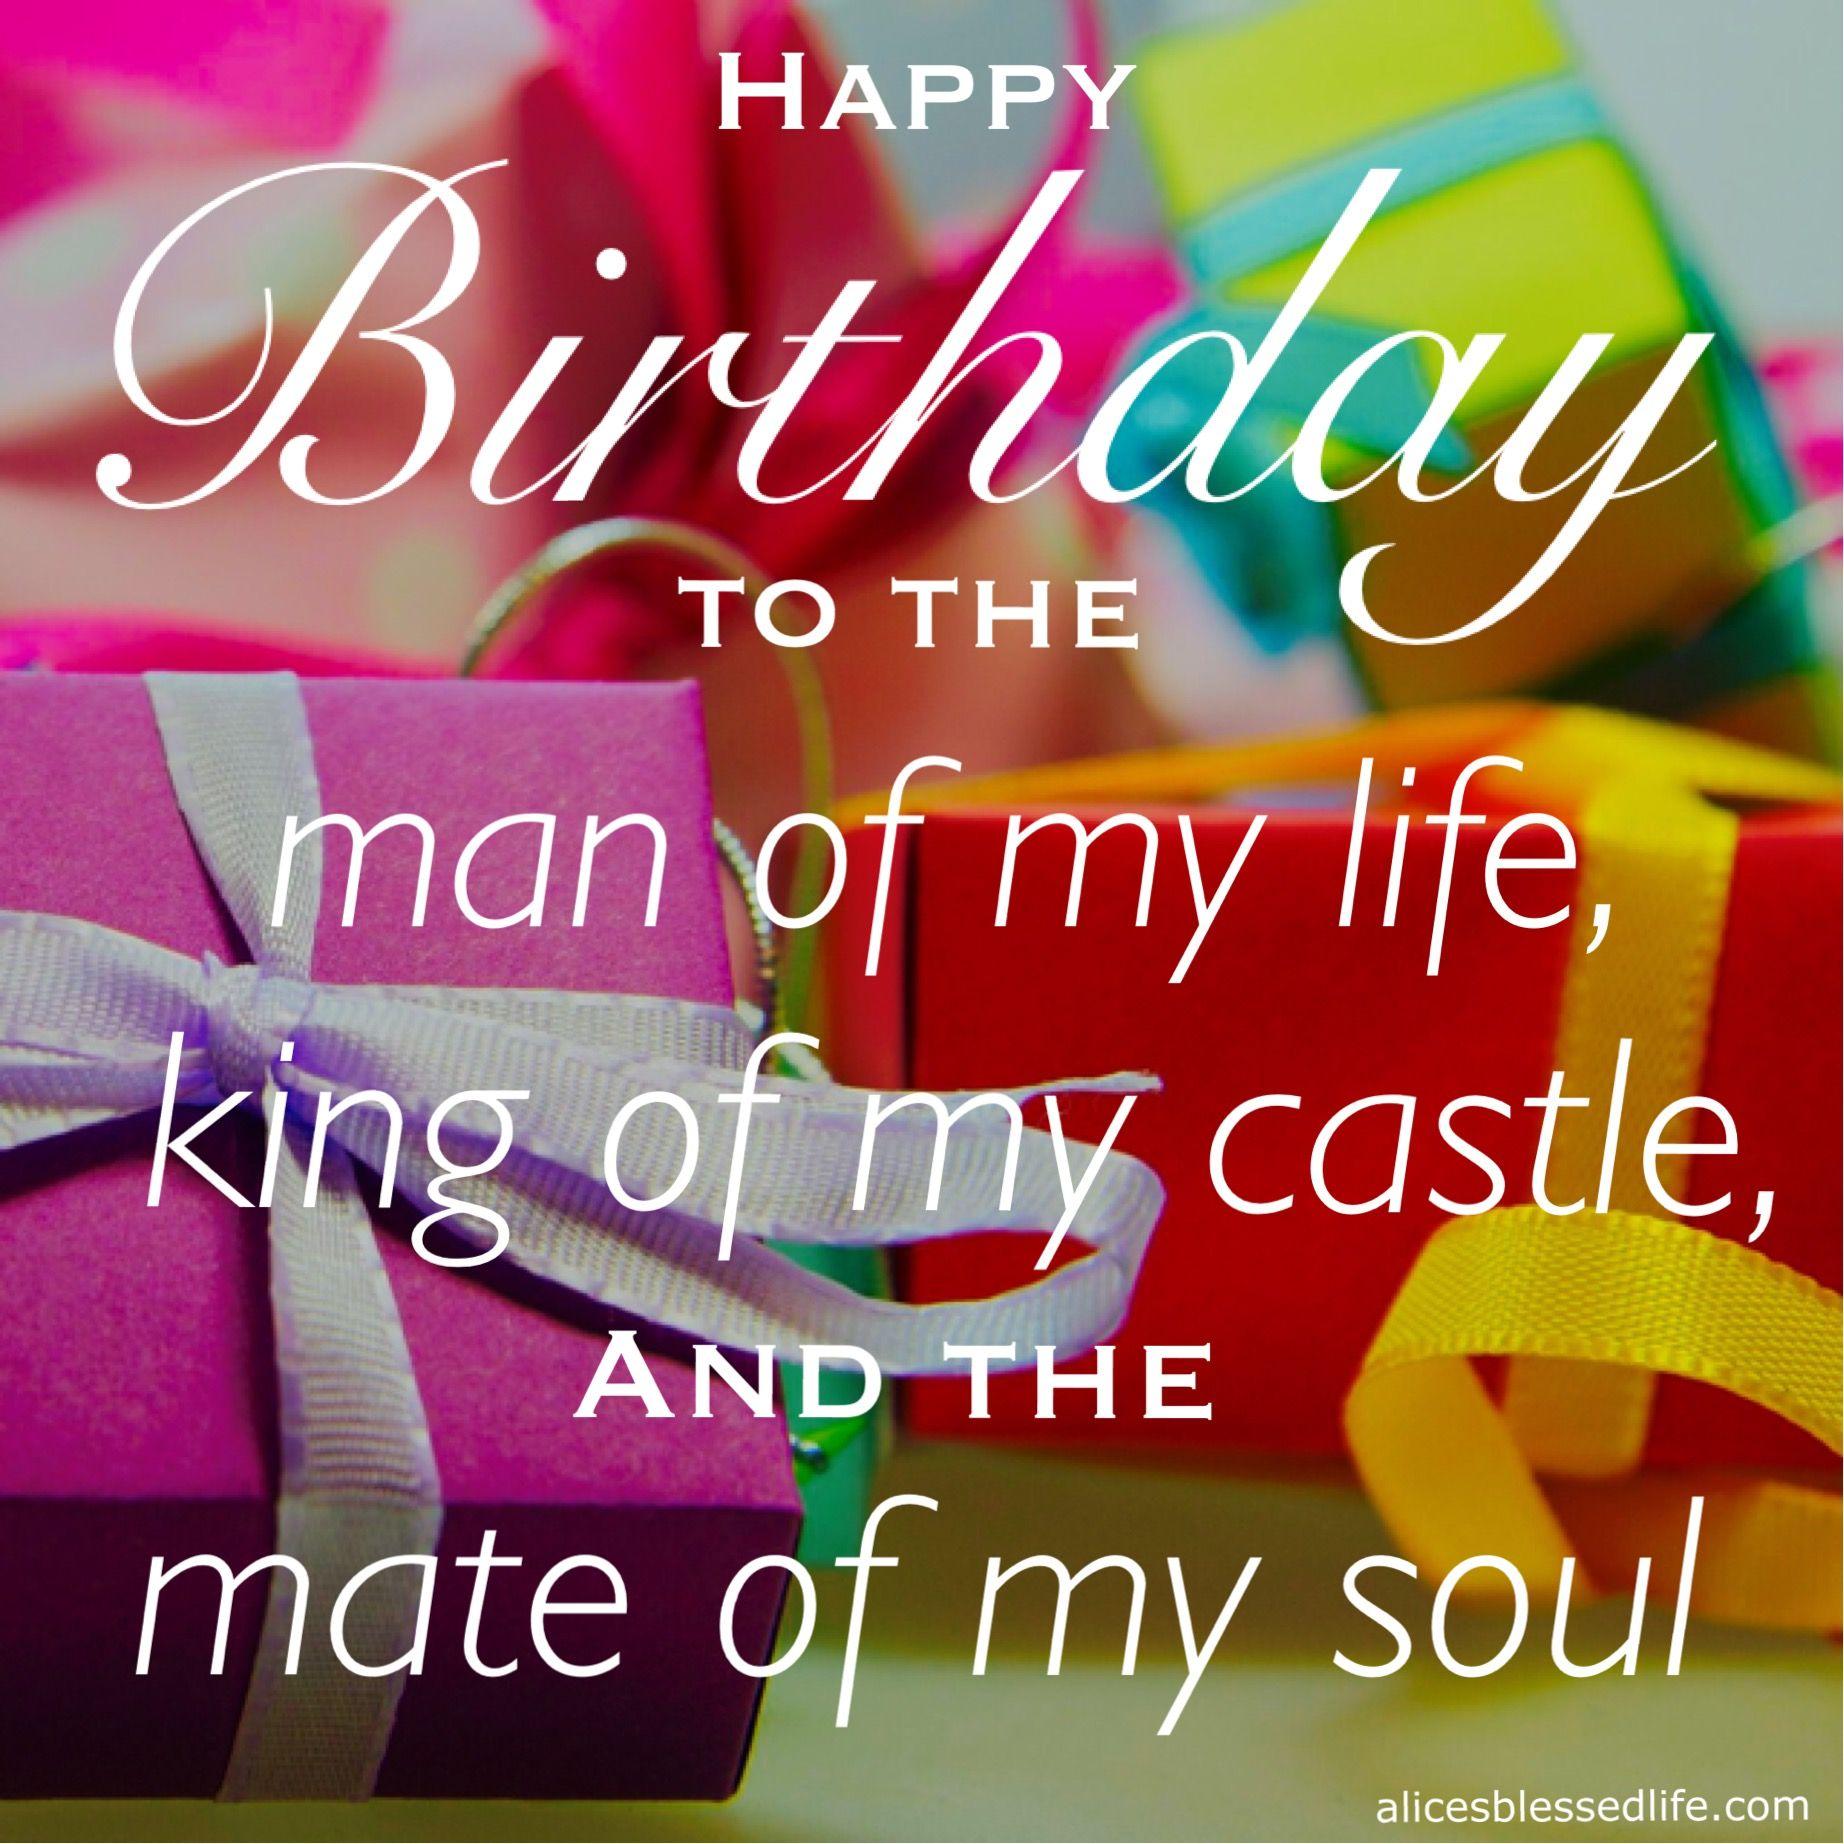 happy birthday mr shepherd happy birthday my love happy birthday hubby quotes